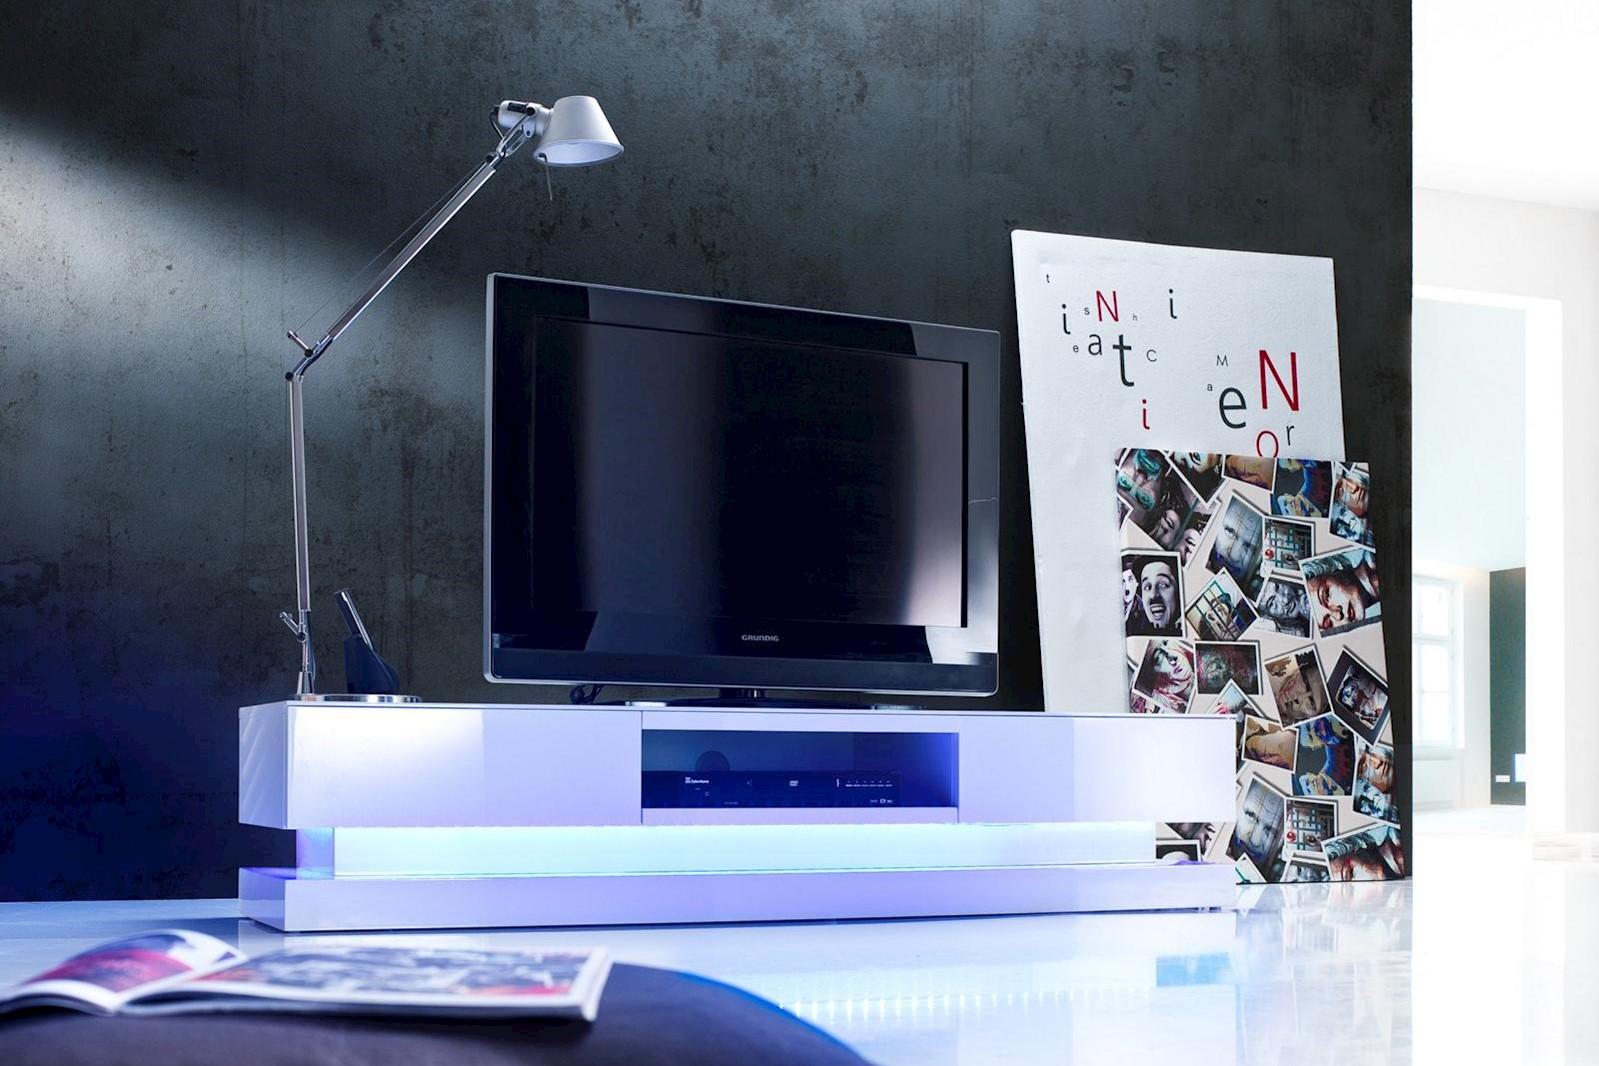 Media-TV-Element Step weiß mit LED inkl. Fernbedienung